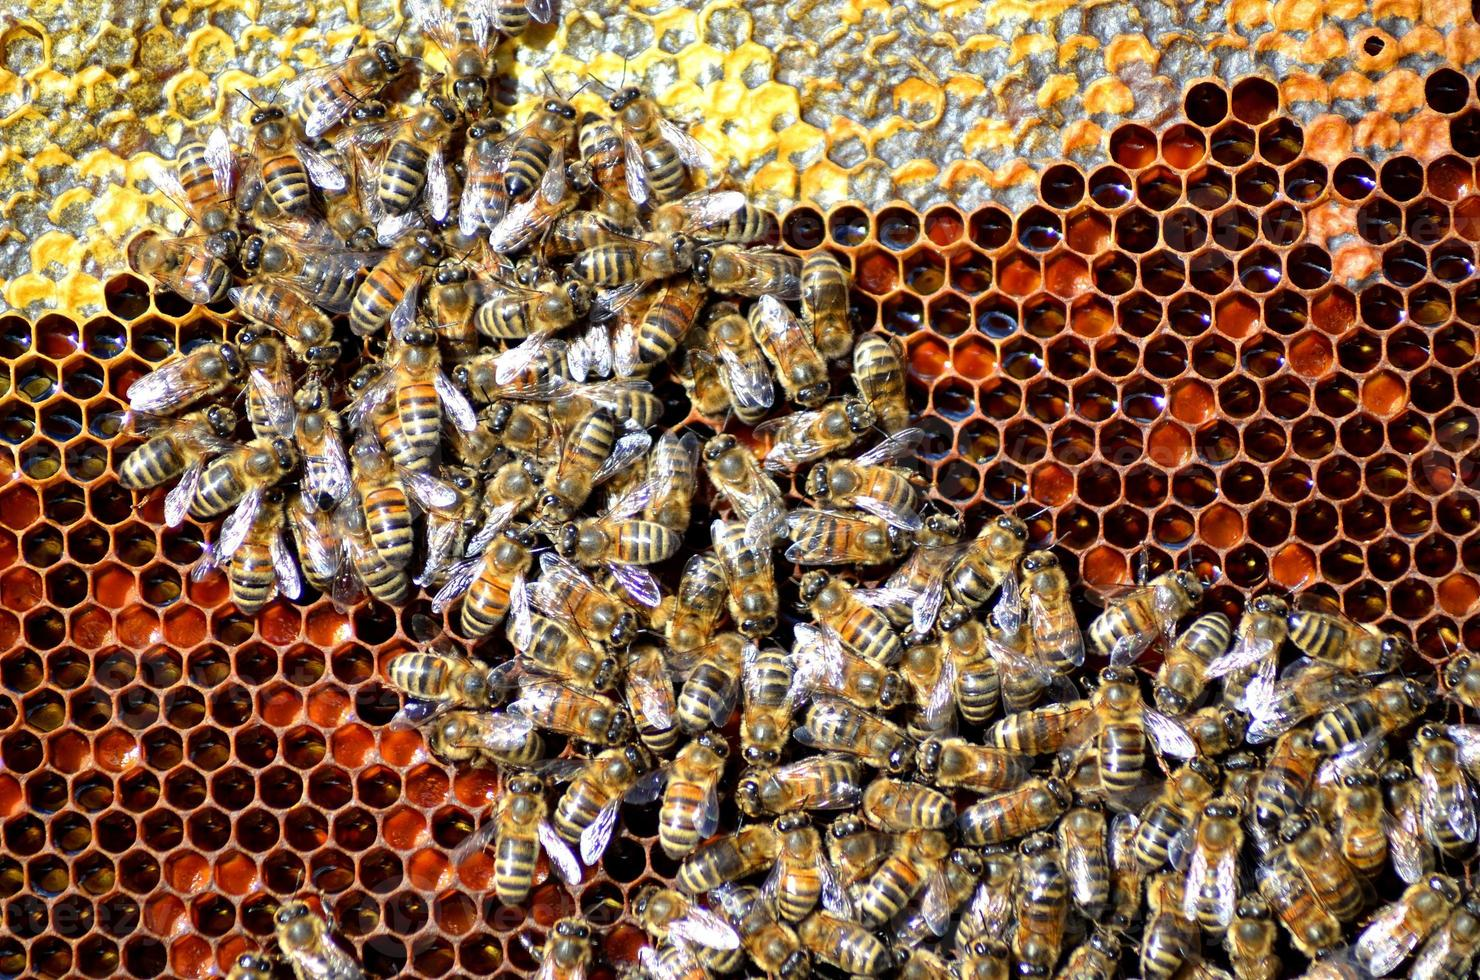 bees on honeycomb photo